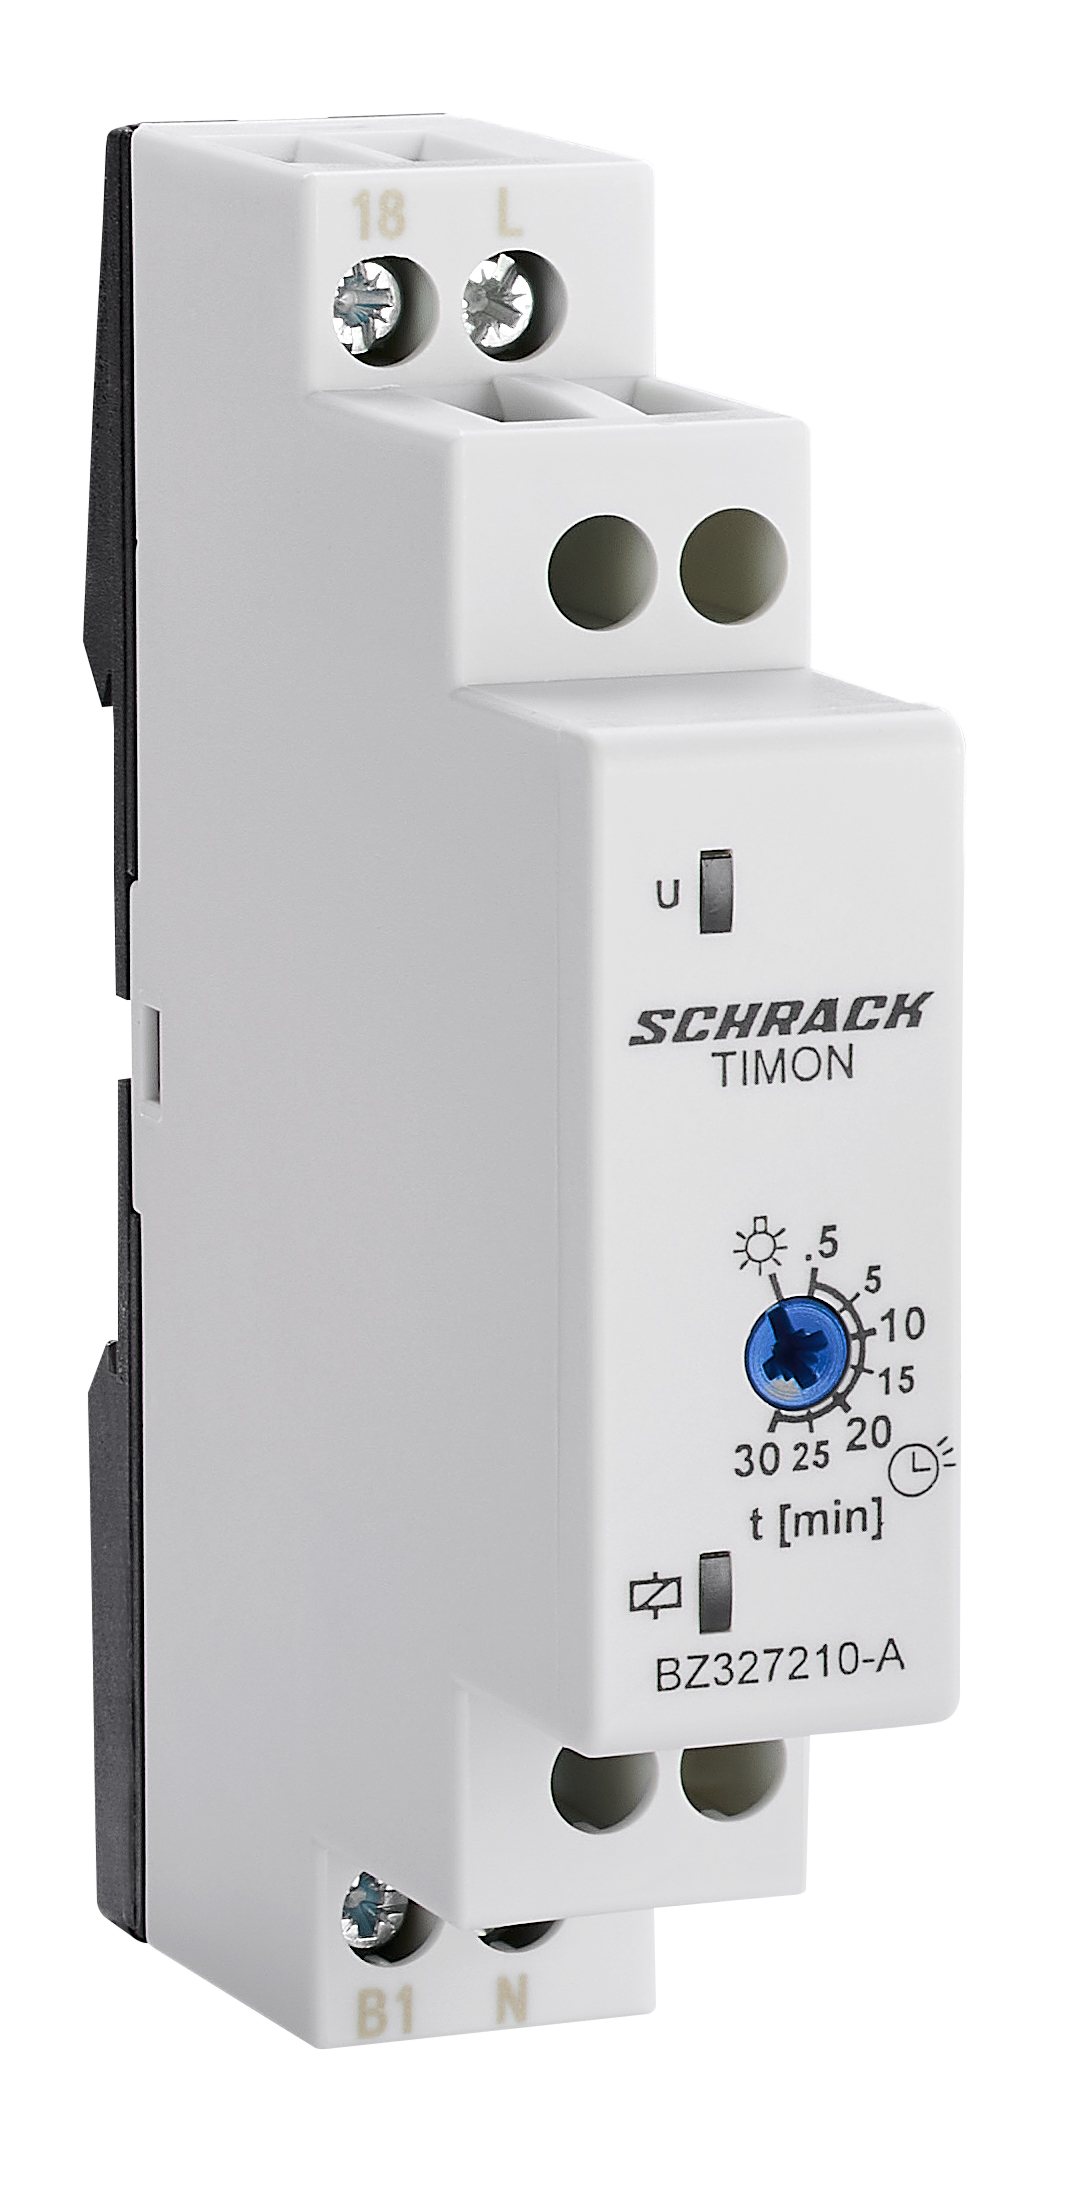 1 Stk Treppenhausautomat TIMON, 0,5-30min, 16A BZ327210-A